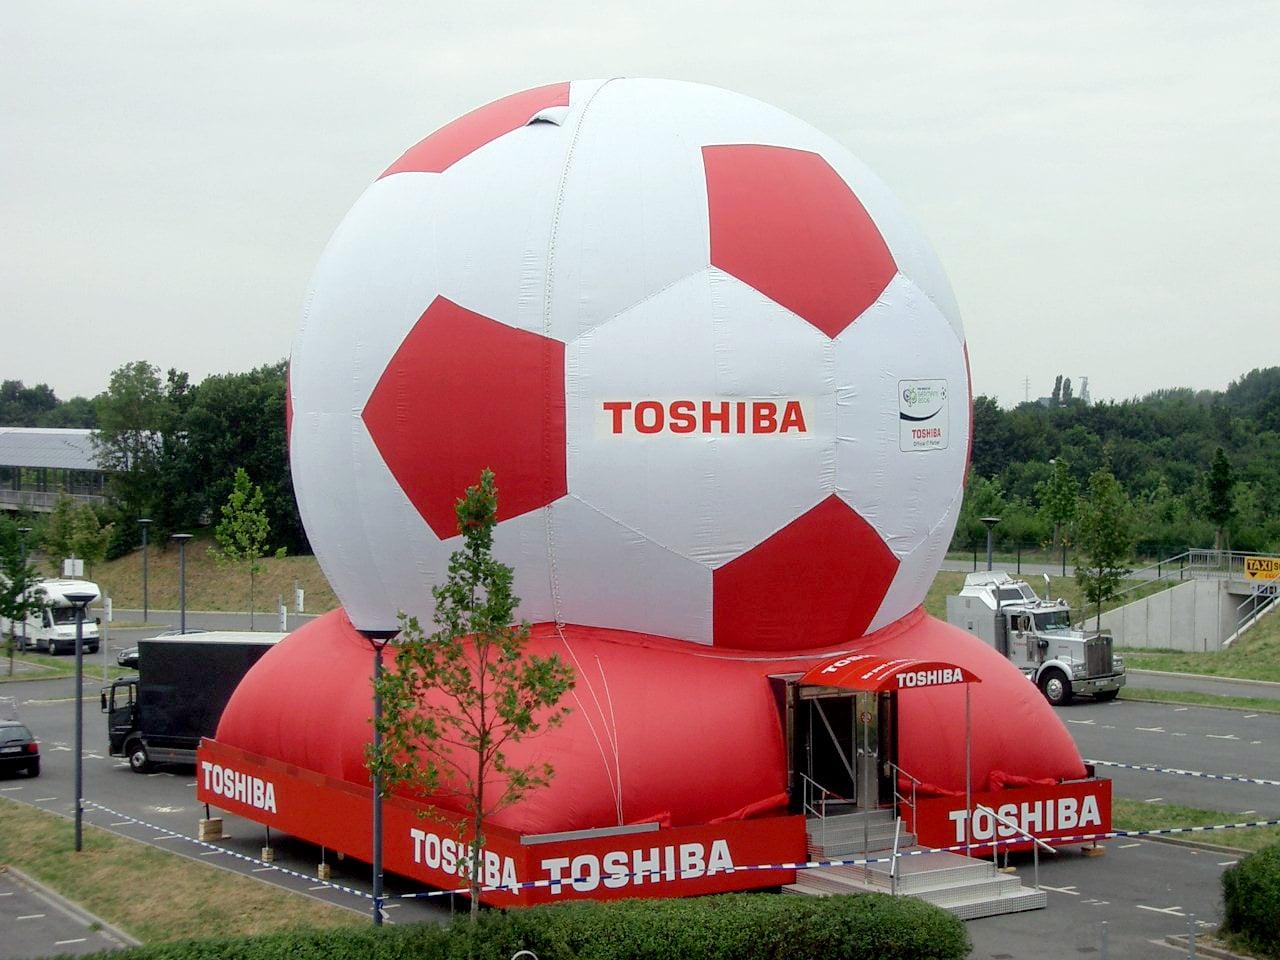 Aufblasbarer Toshiba Fußball